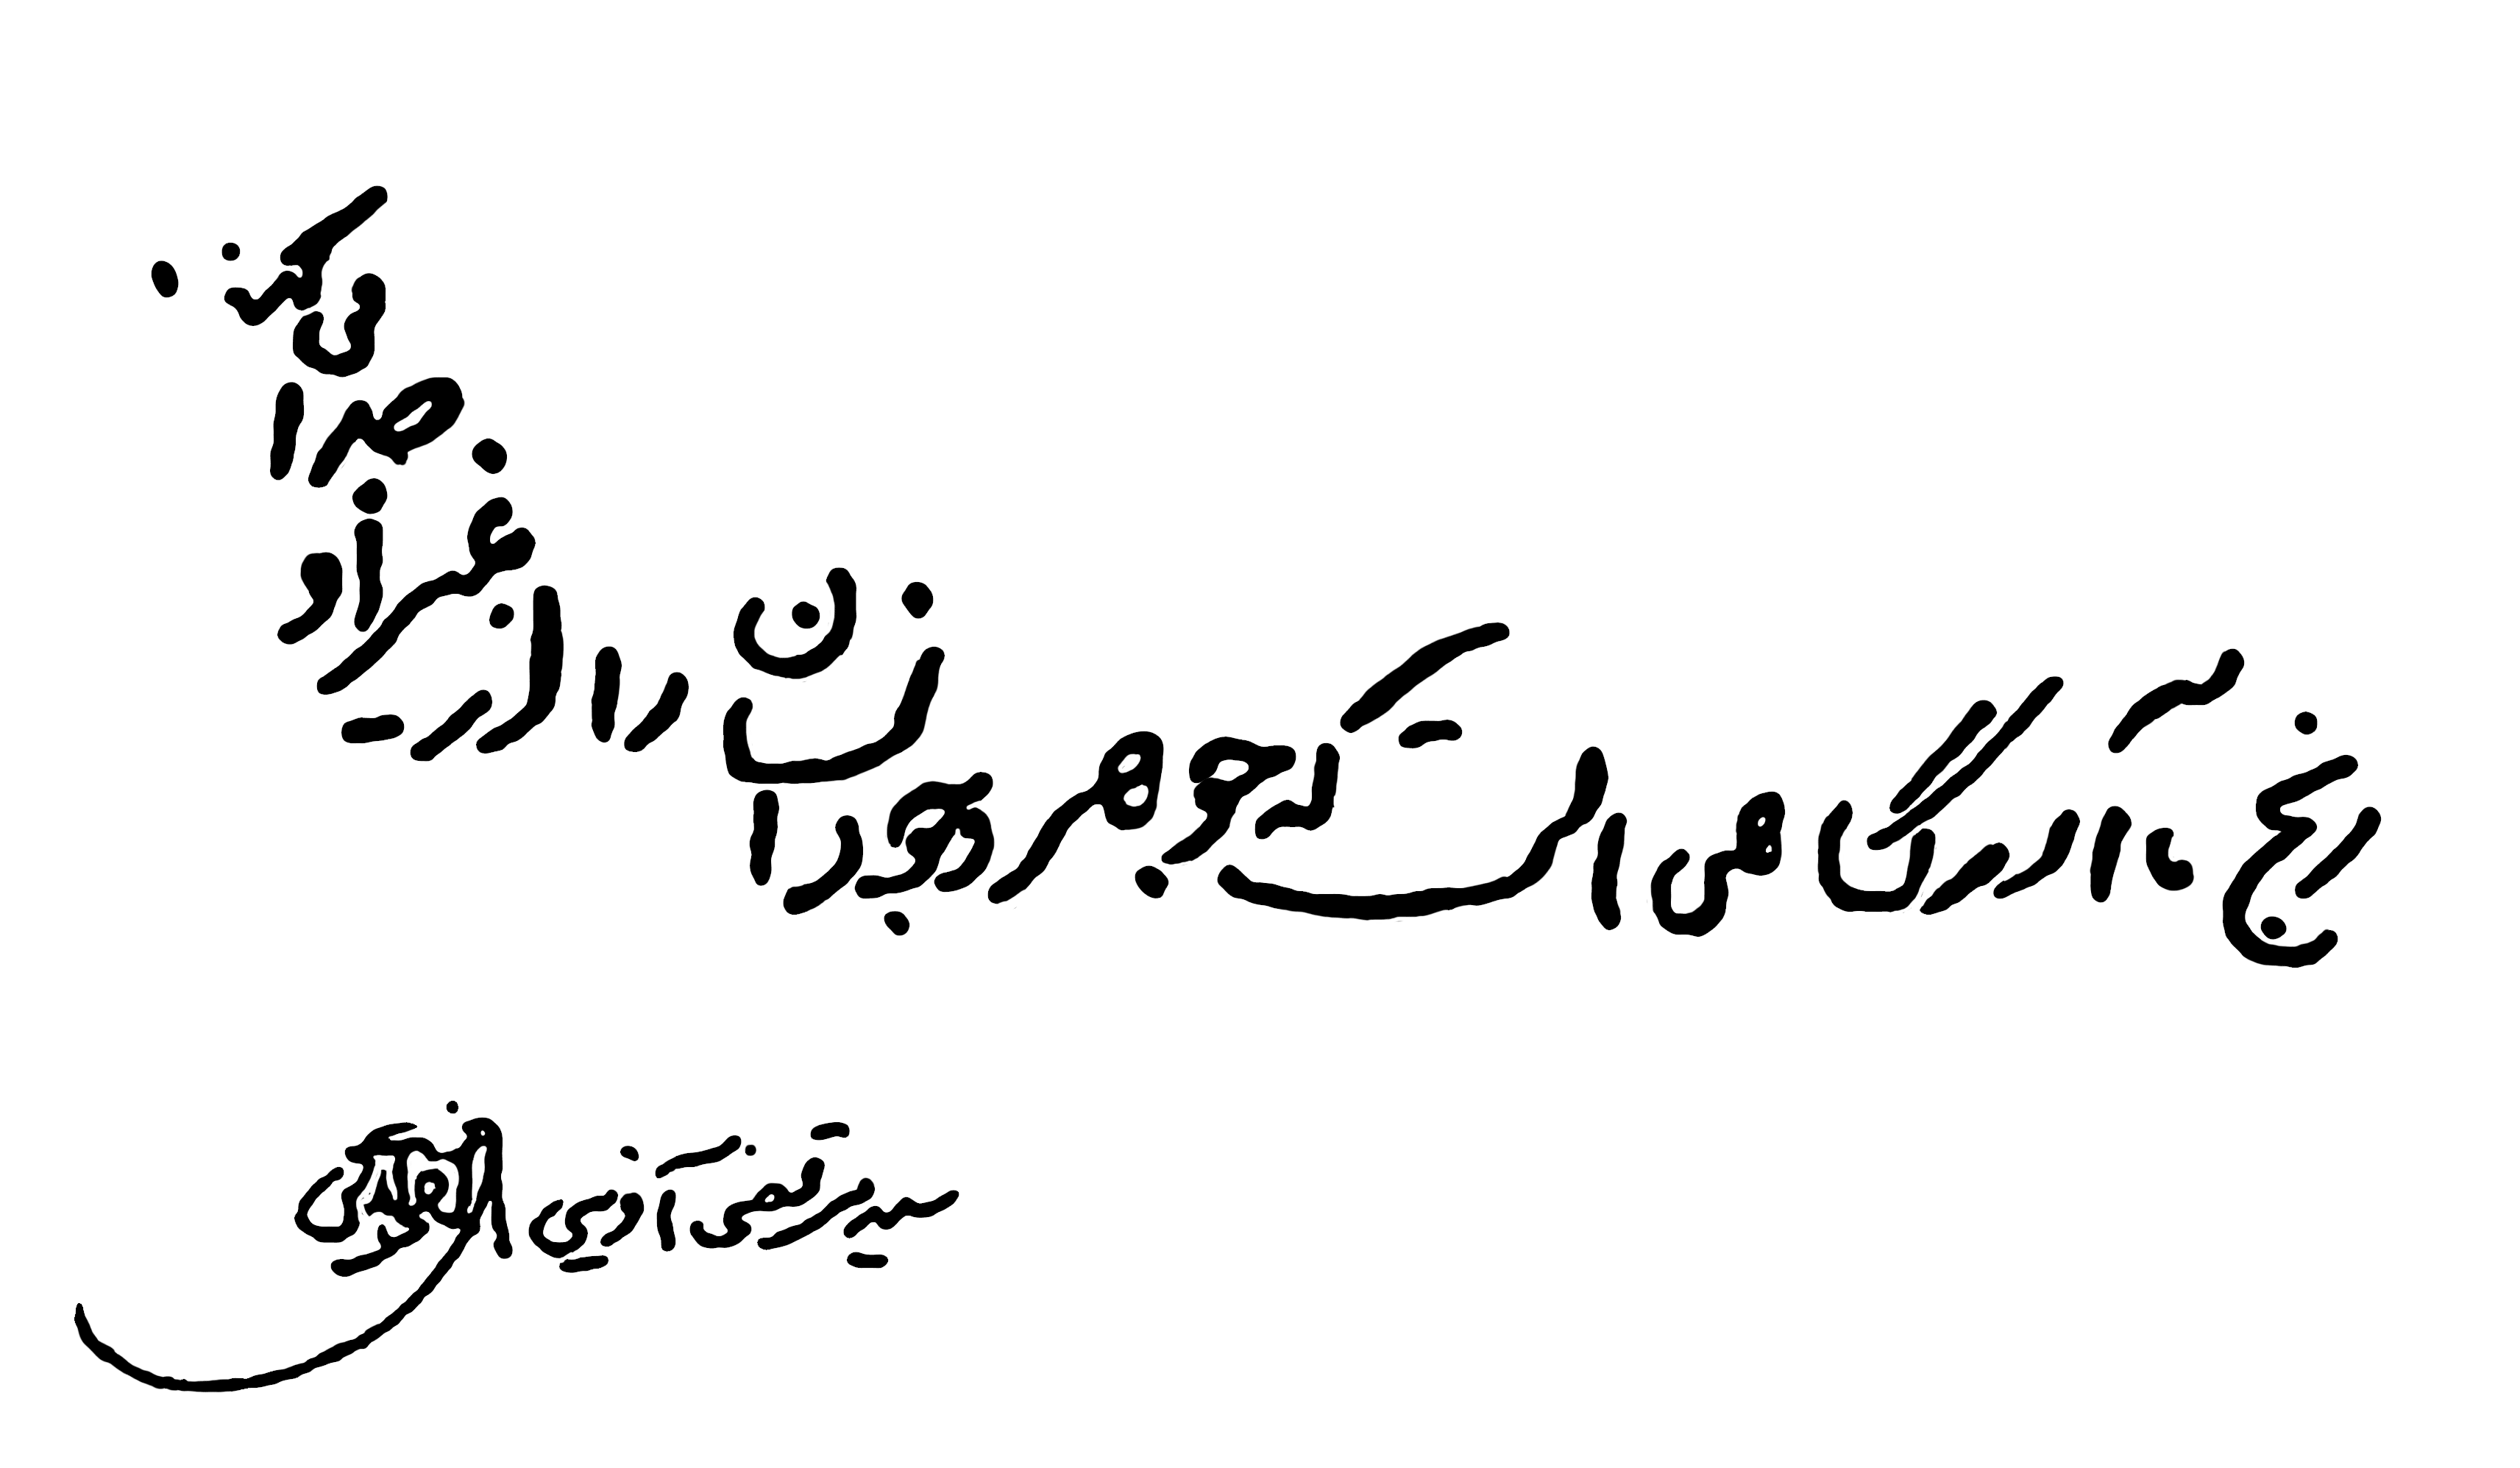 http://dl.aviny.com/Album/defa-moghadas/Shakhes/aviny/DAST_NEVESHTEH/kamel/17.png